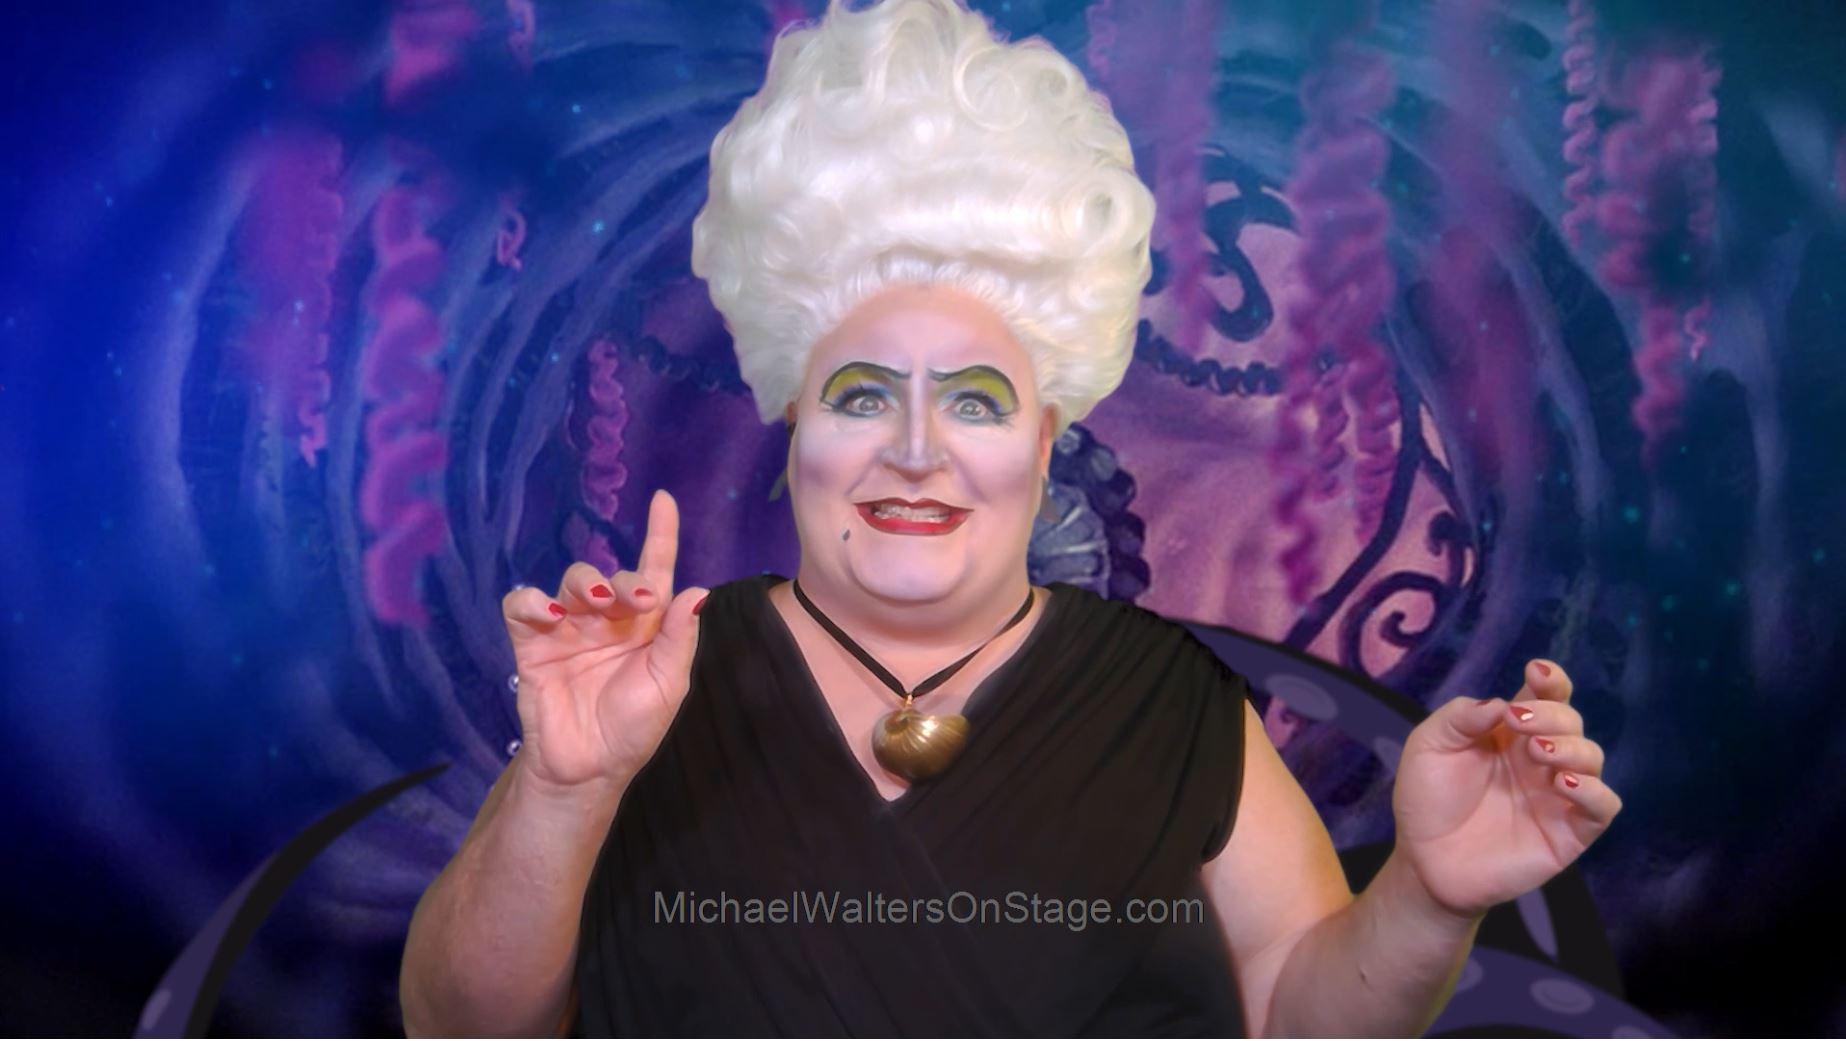 Actor Michael Walters as Ursula (The Little Mermaid, Digital concert)